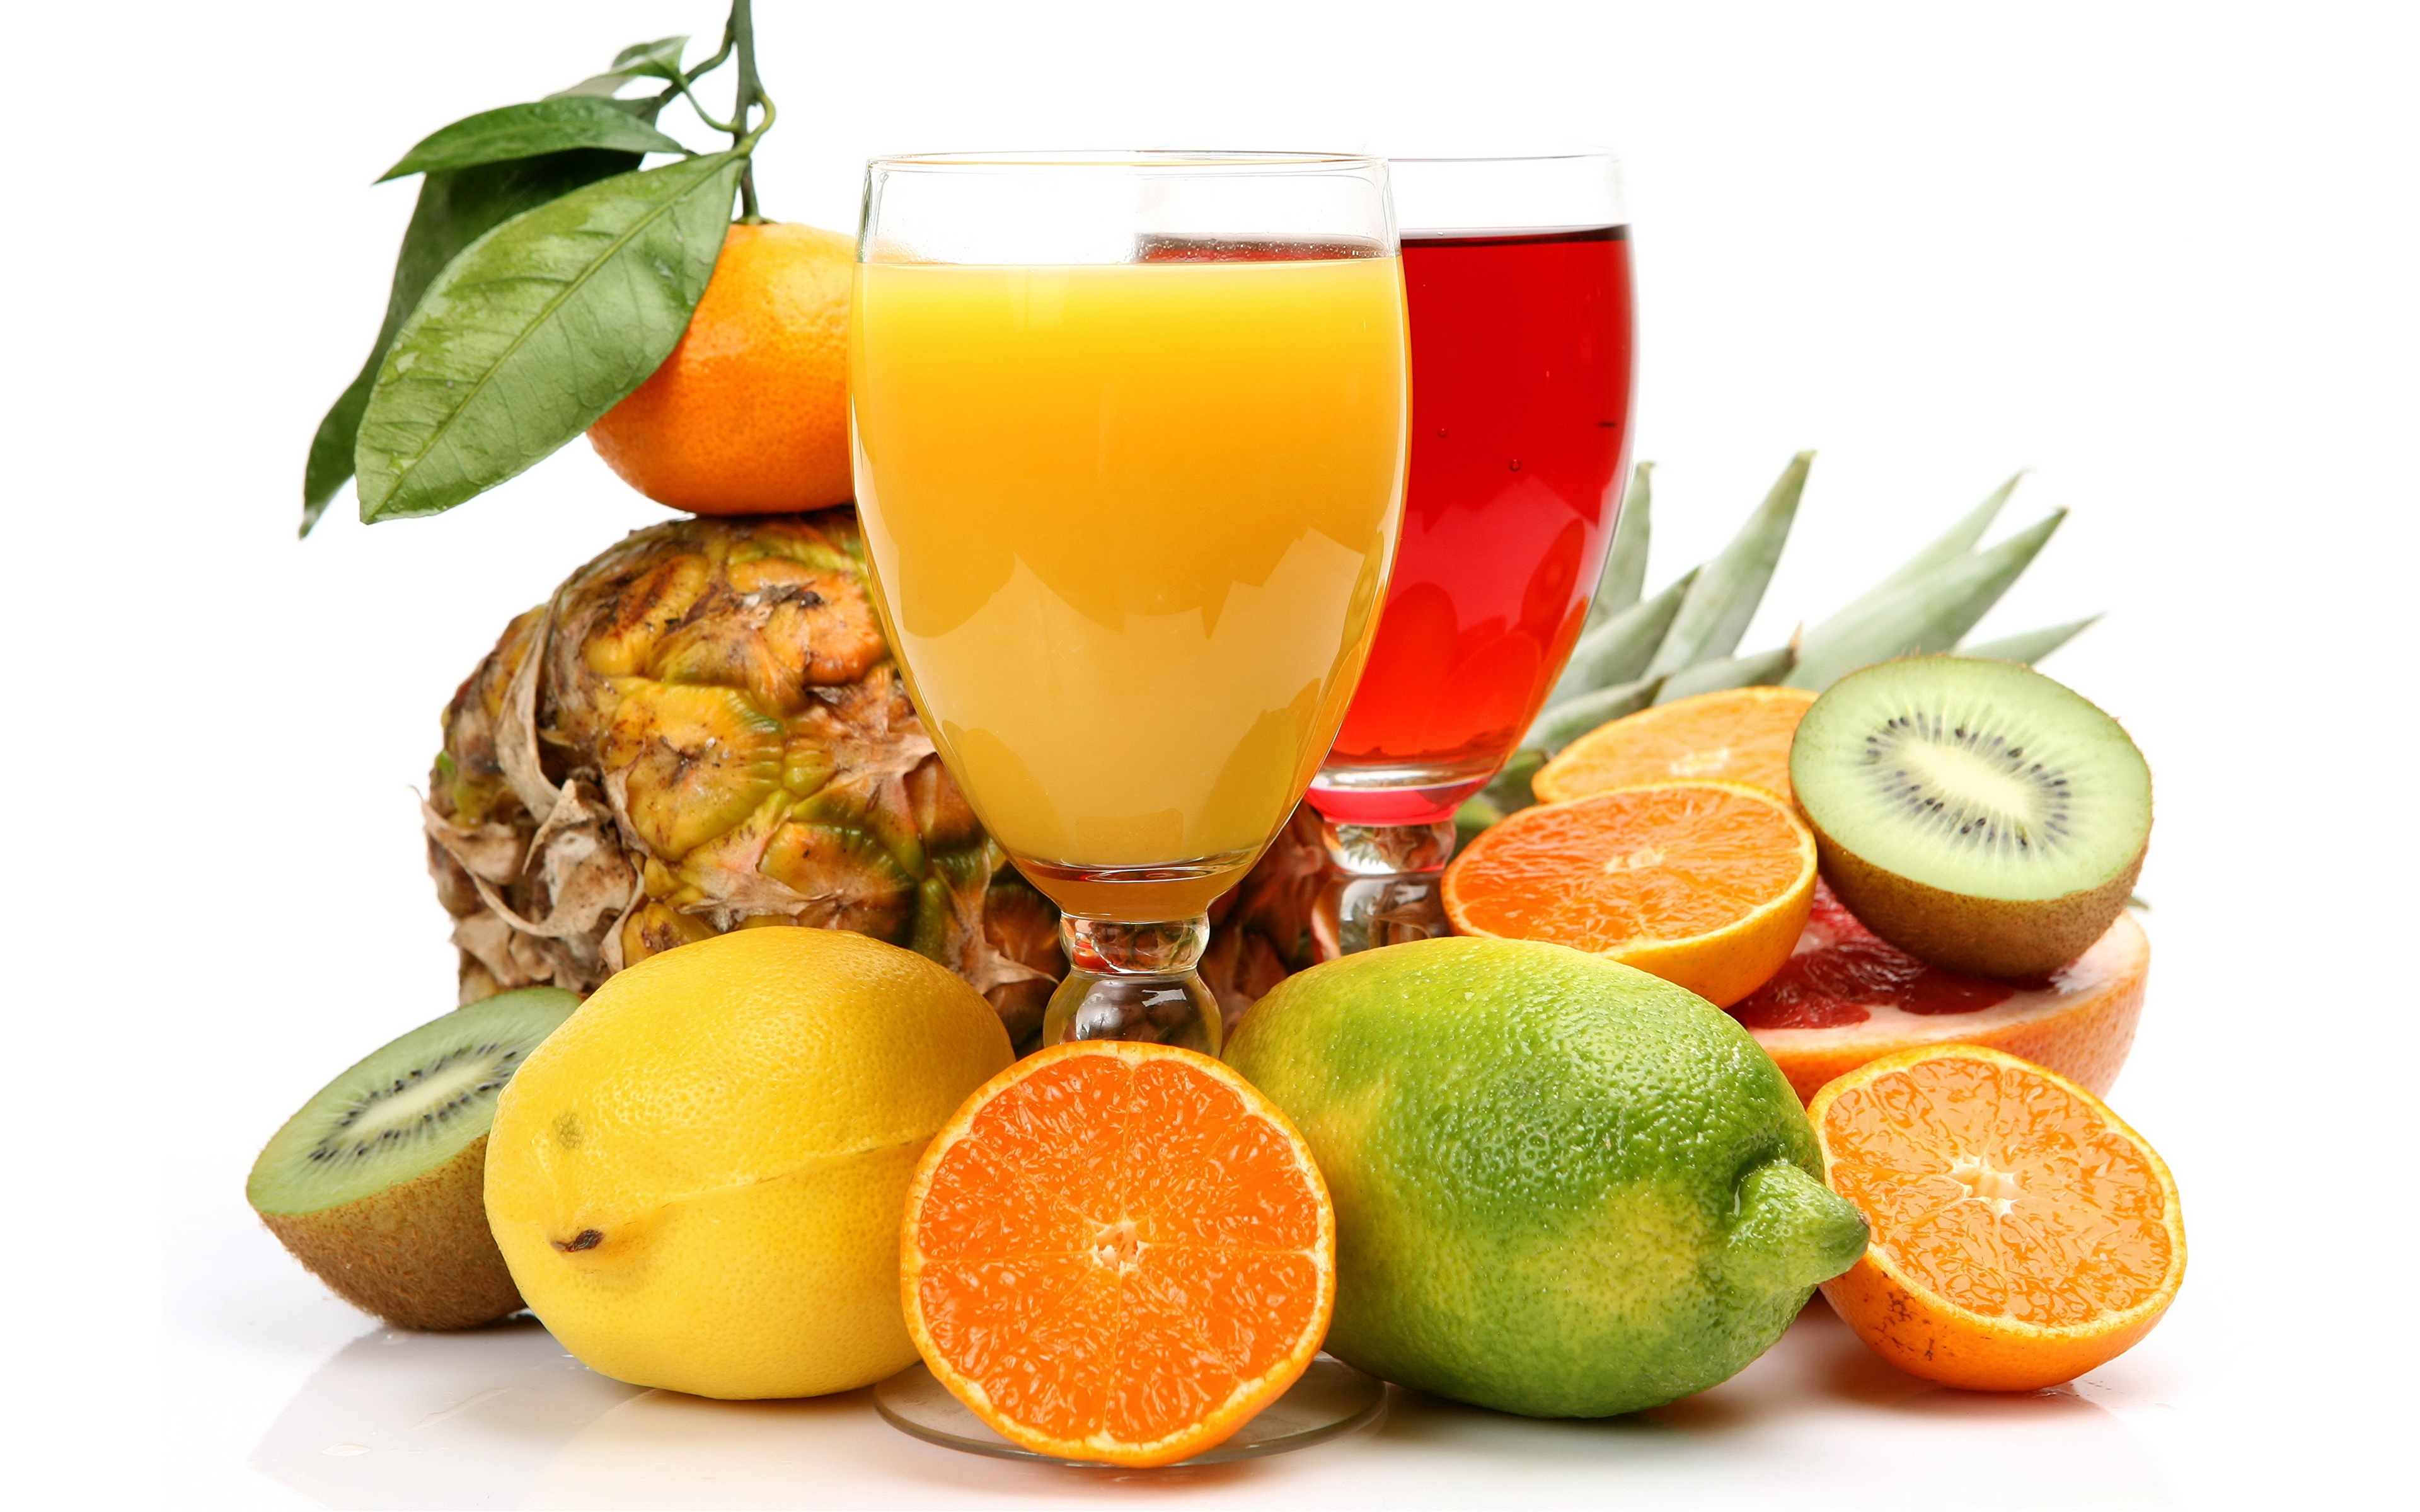 еда апельсин сок food orange juice  № 613478 бесплатно